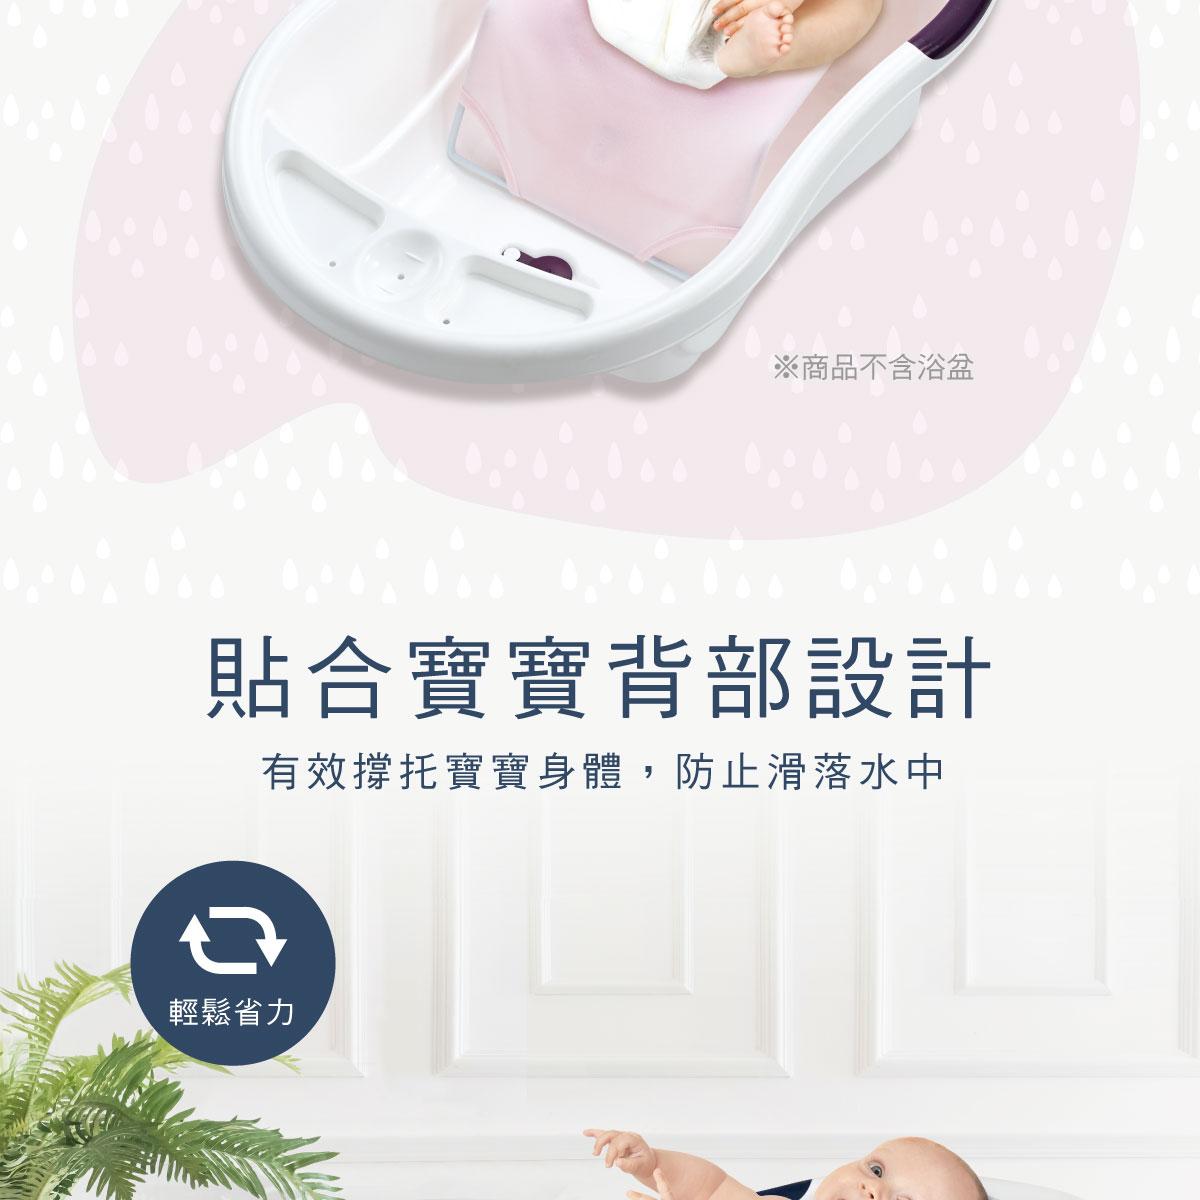 proimages/Bathing&CleanSeries/Bathing/BabyBathTub/1133/1133-成長印記沐浴床-EDM-4.jpg